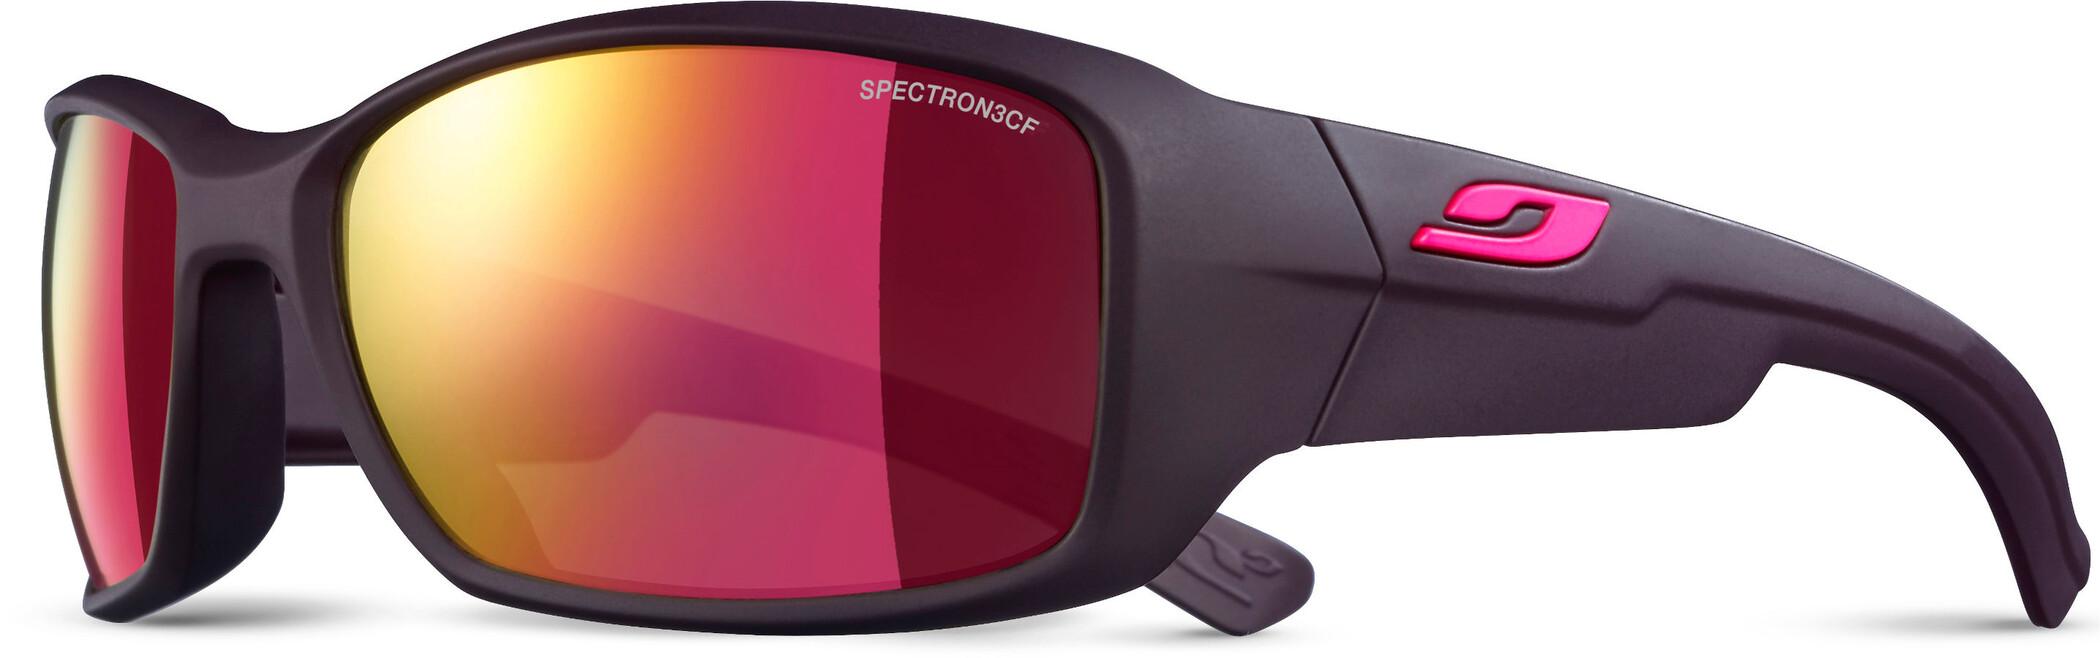 Julbo Whoops Spectron 3CF Solbriller, aubergine/pink-pink (2020) | Glasses